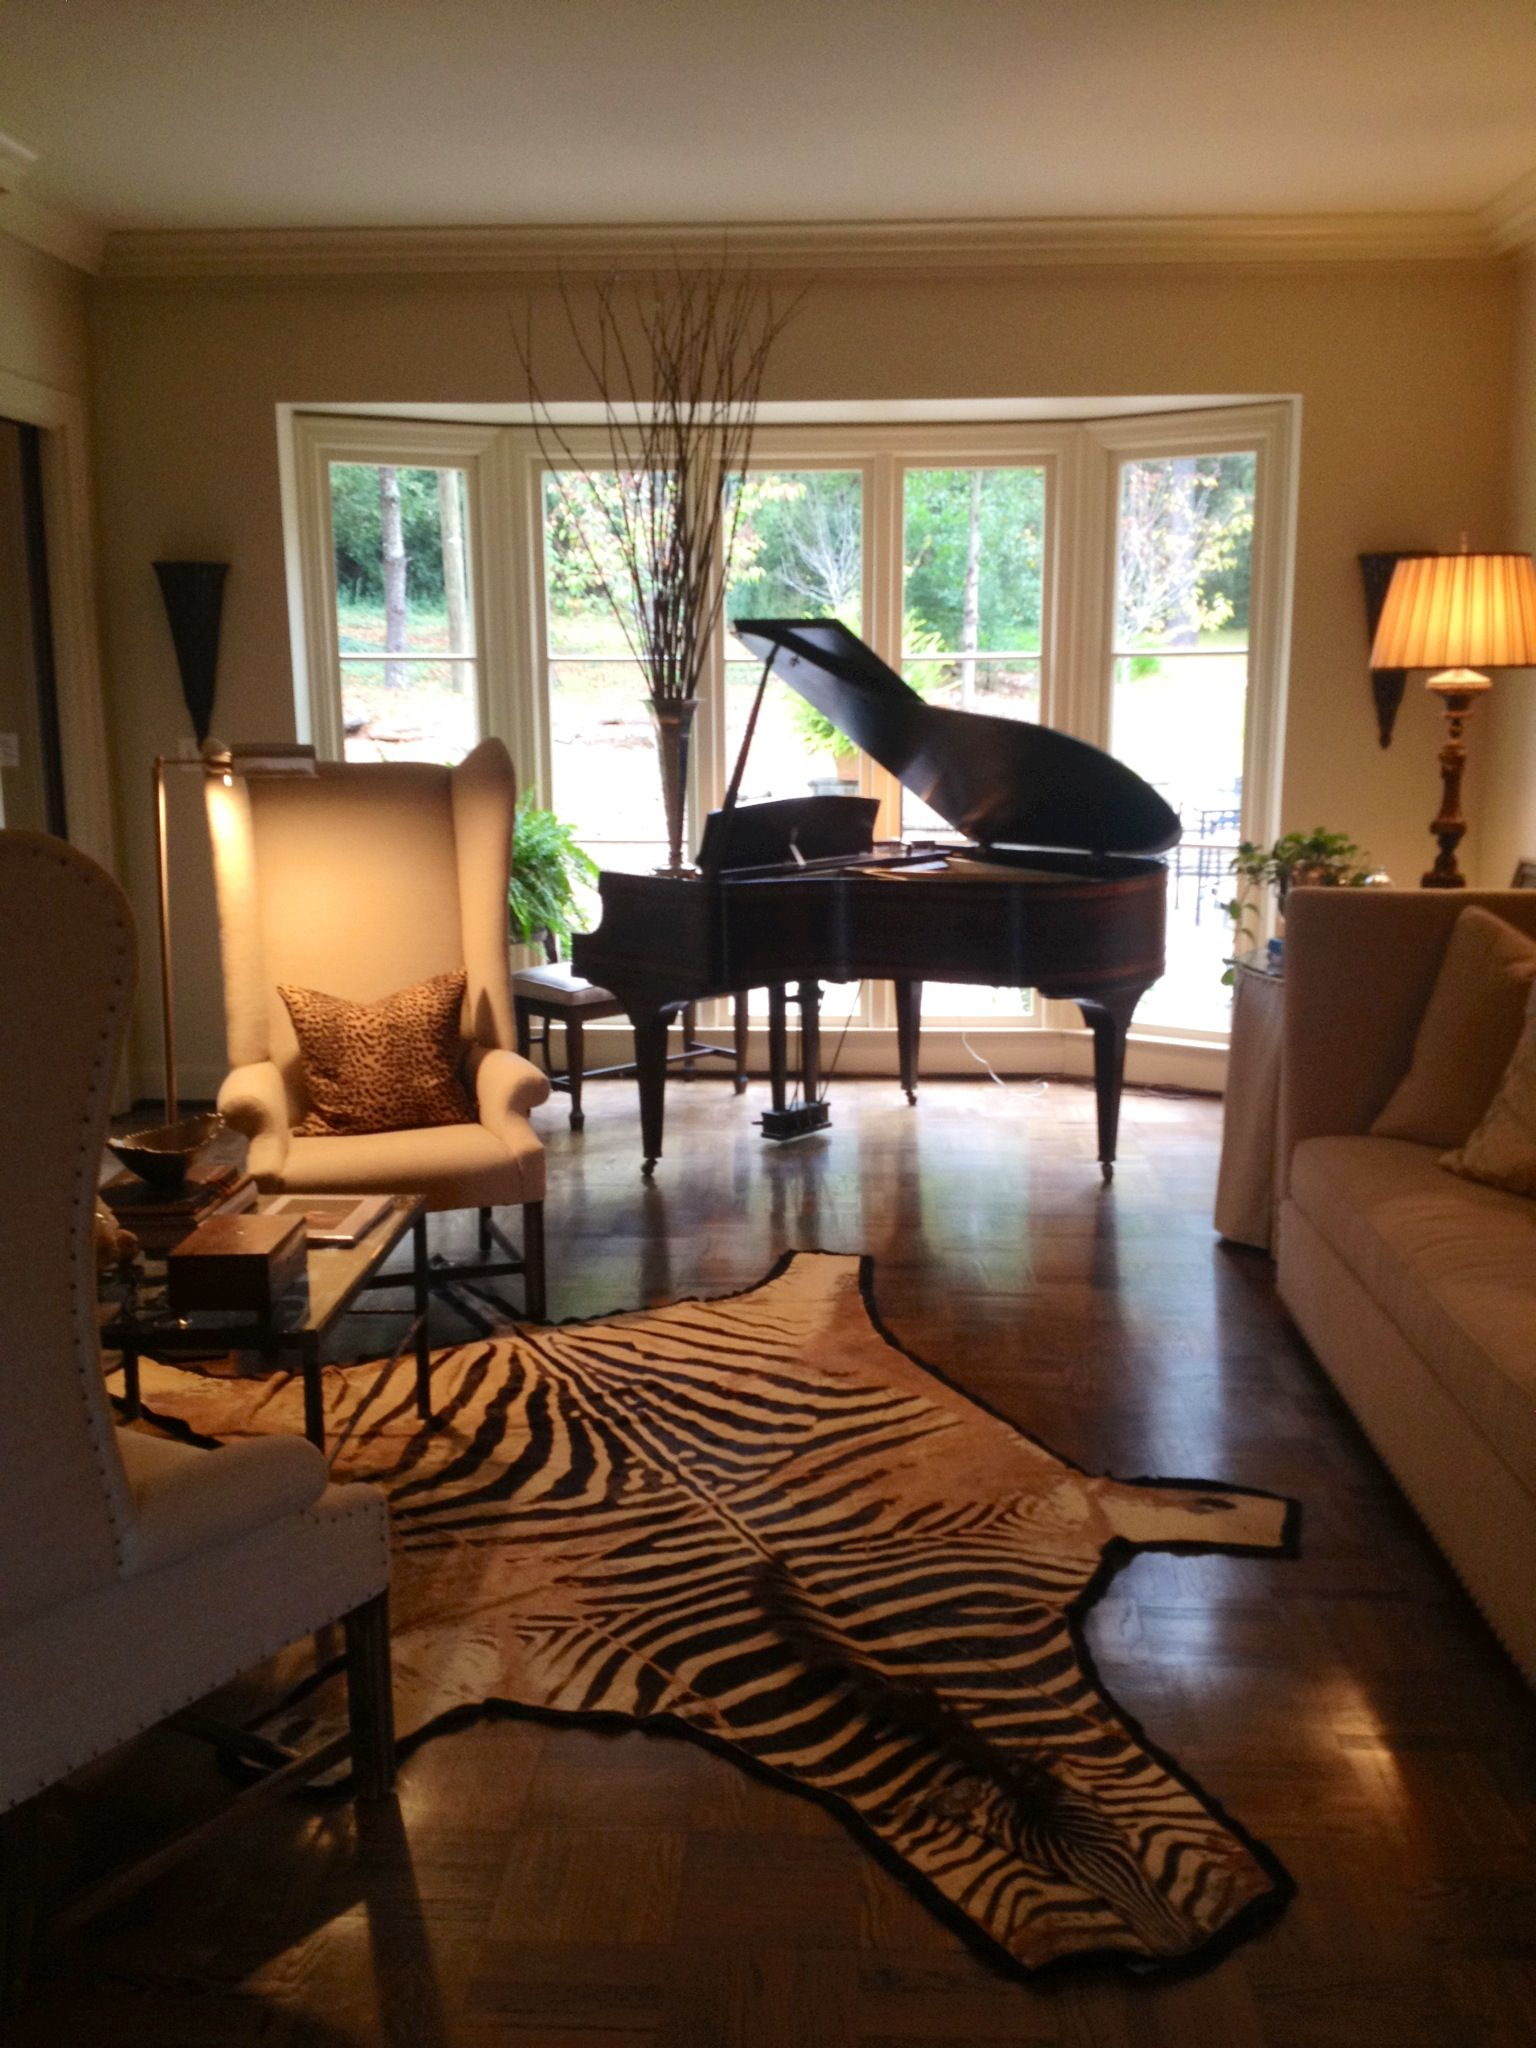 Grand Living Room: Piano Room- Minus The Zebra On The Floor...